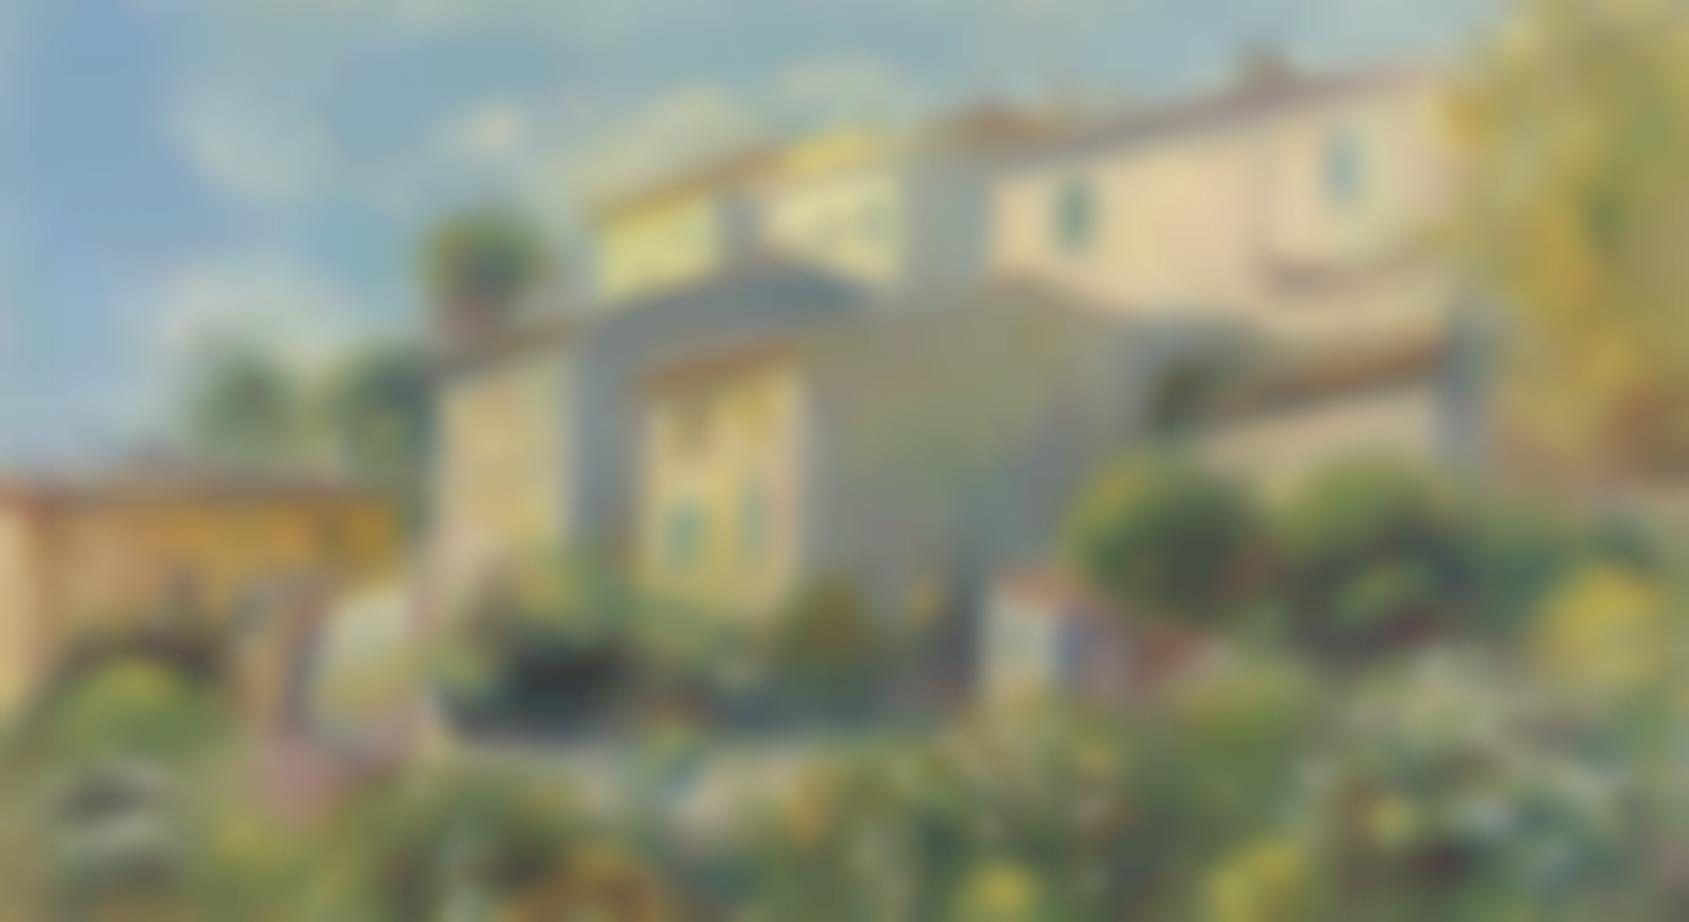 Pierre-Auguste Renoir-Vue de la Poste a Cagnes-1907